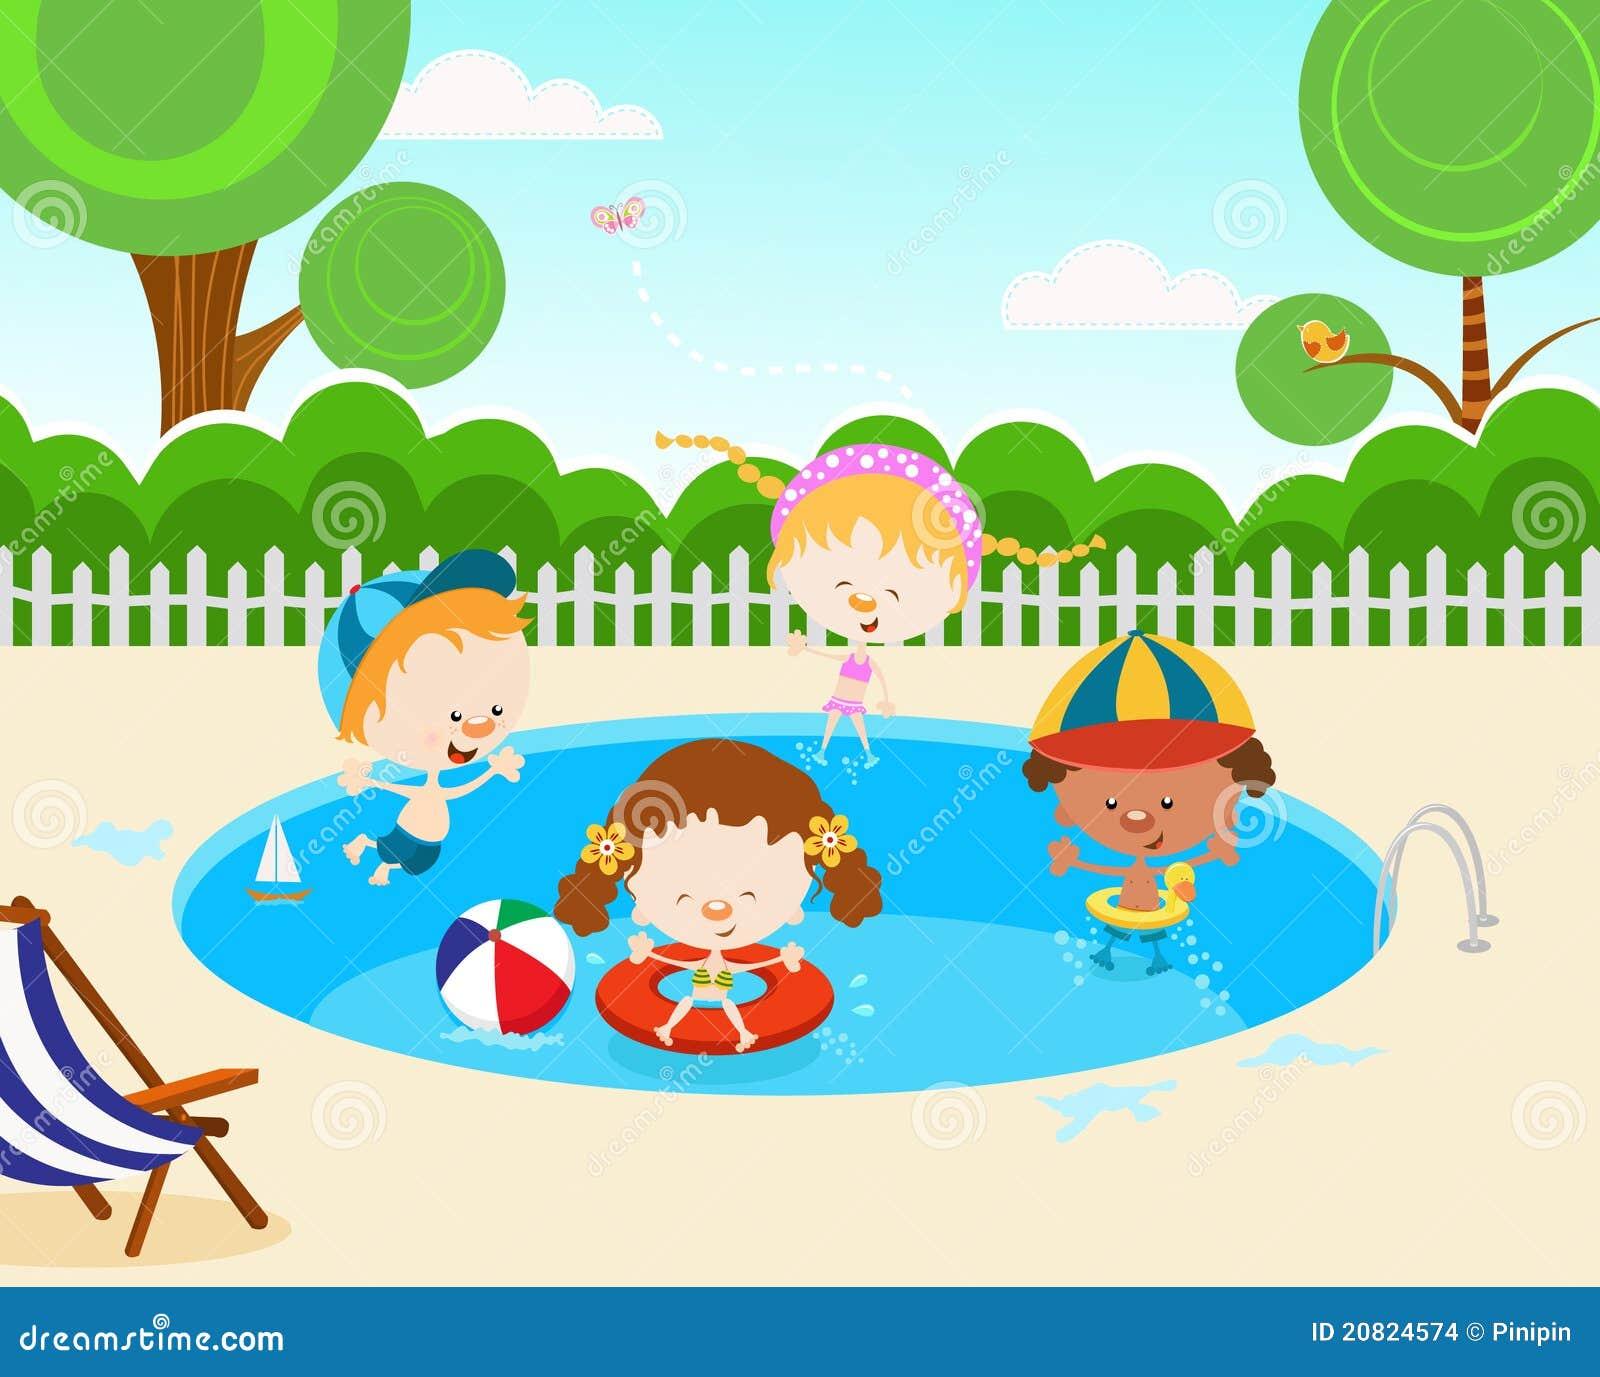 Kids swimming clipart  Kids Swimming Pool Stock Illustrations – 567 Kids Swimming Pool ...